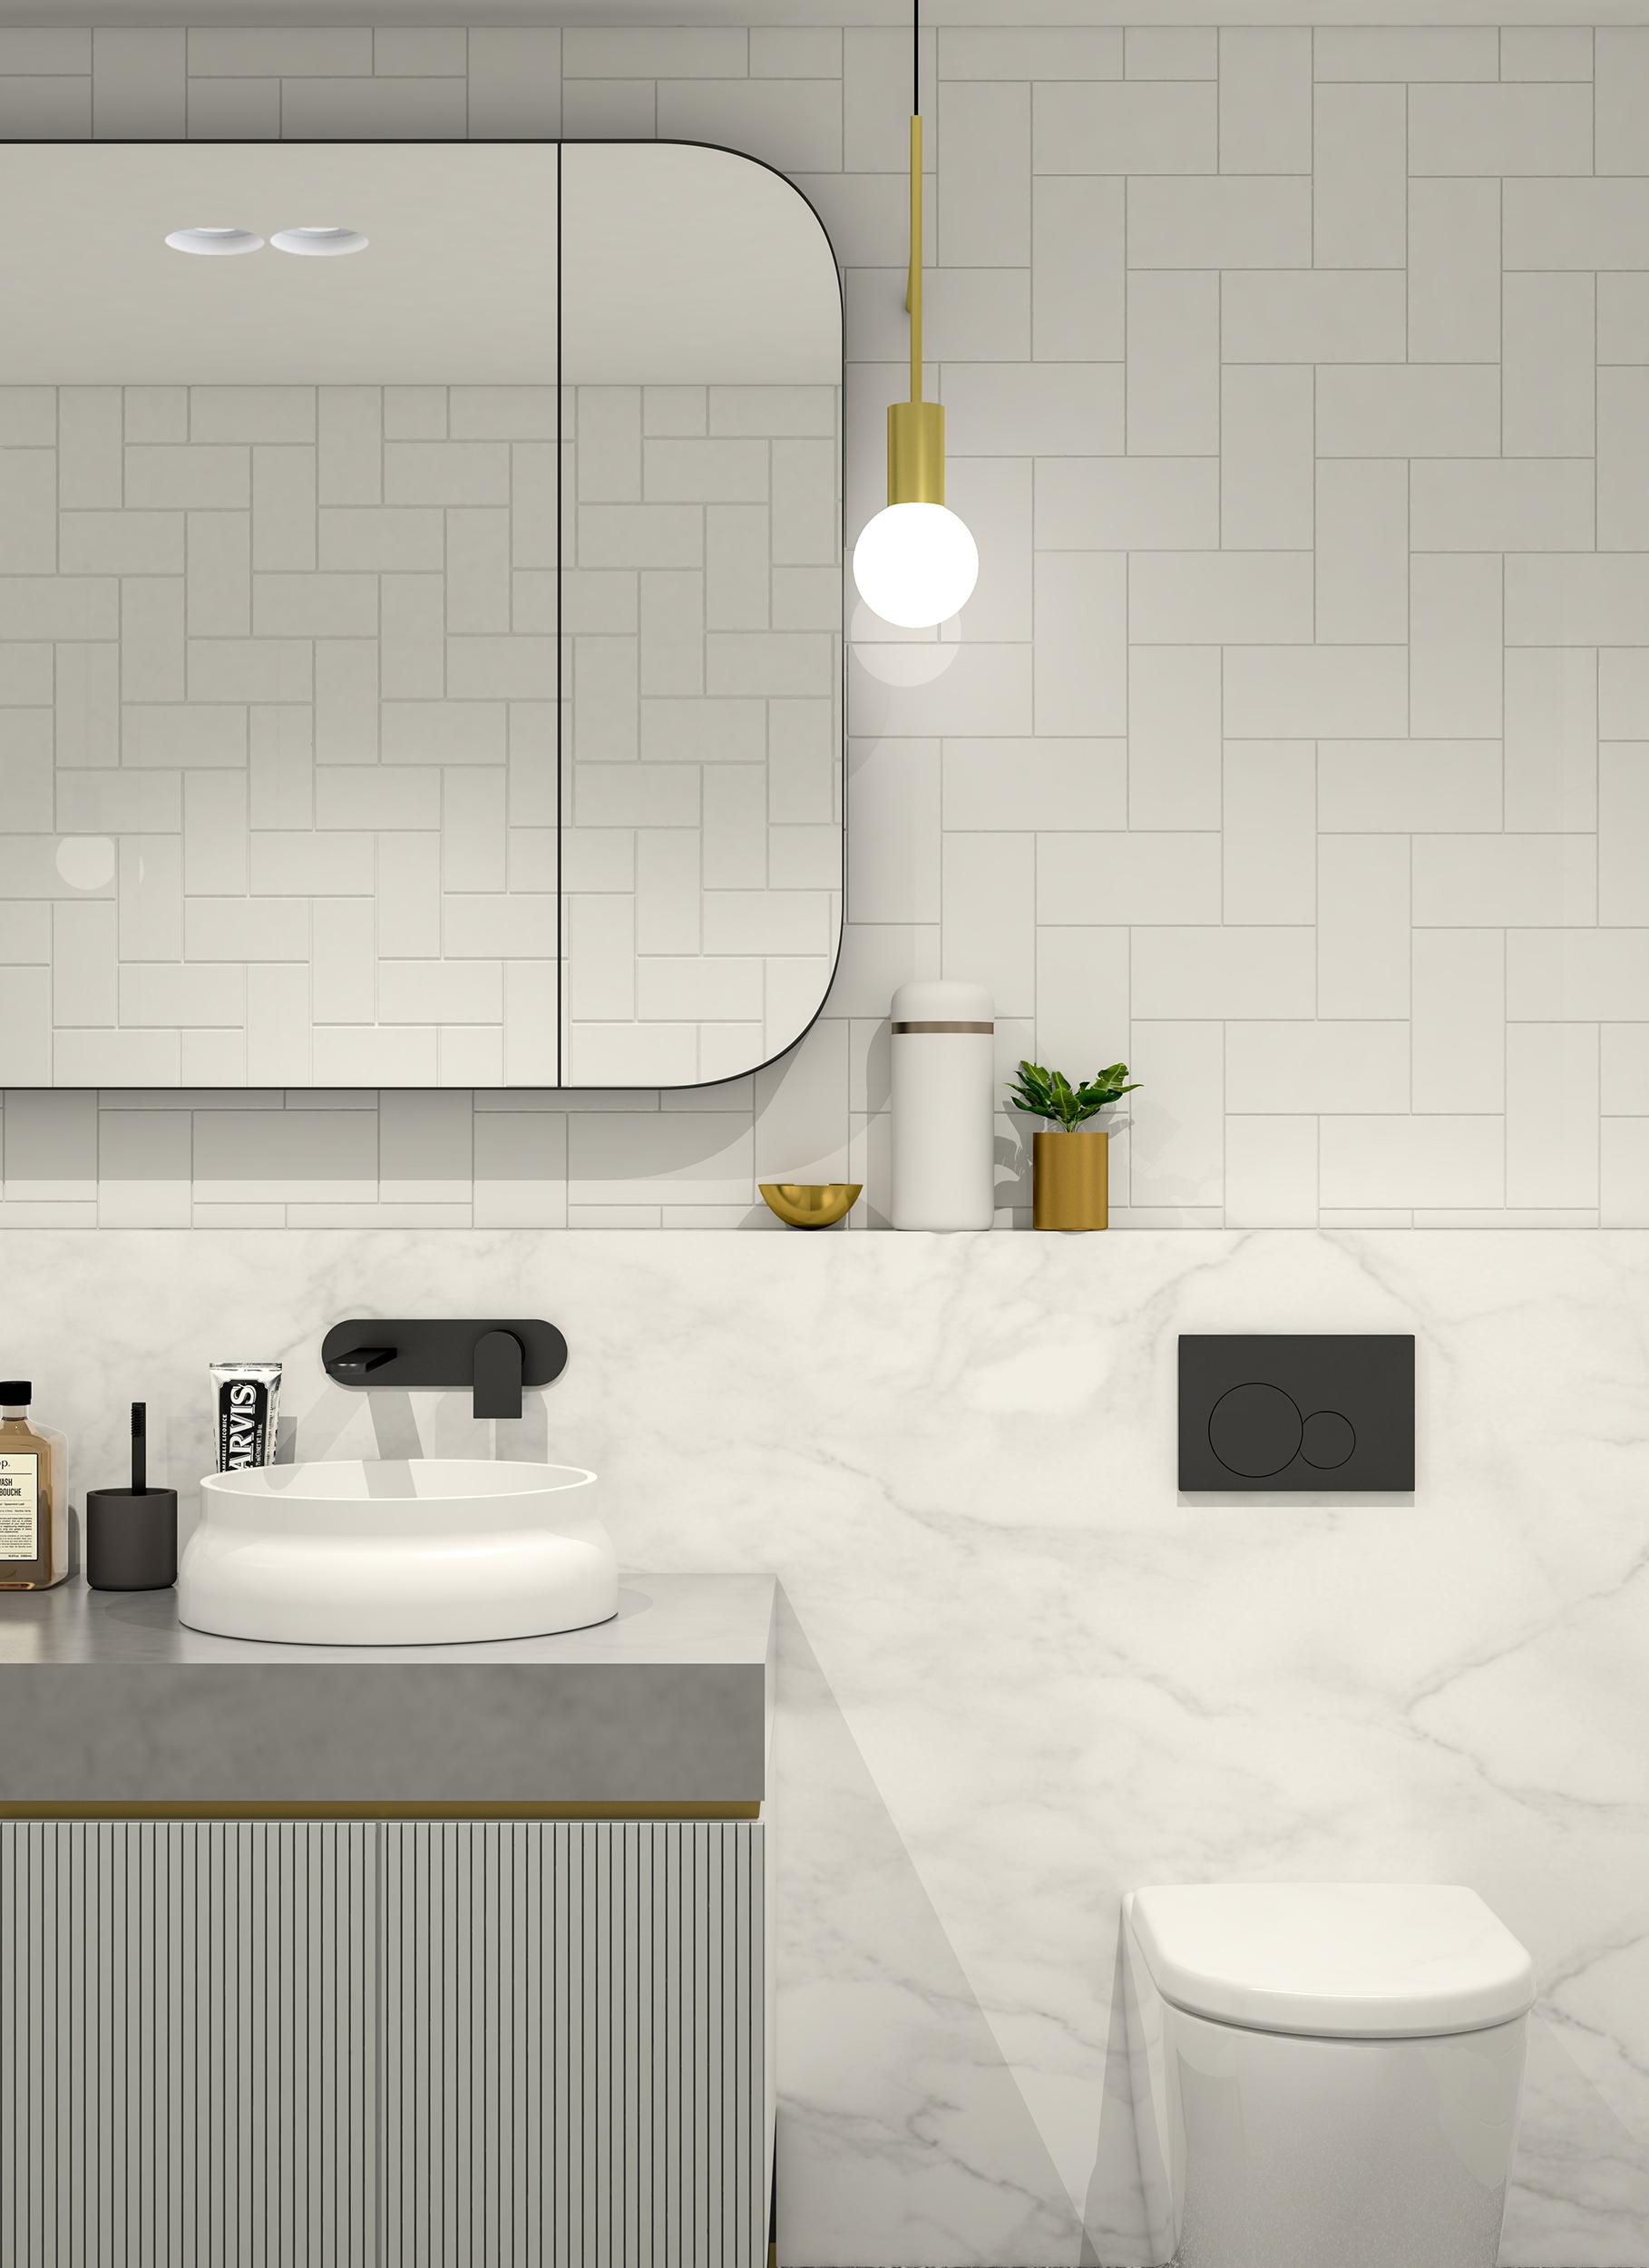 Well St - Apartment 1 - Bathroom Detail 2 - Light Scheme MR.jpg